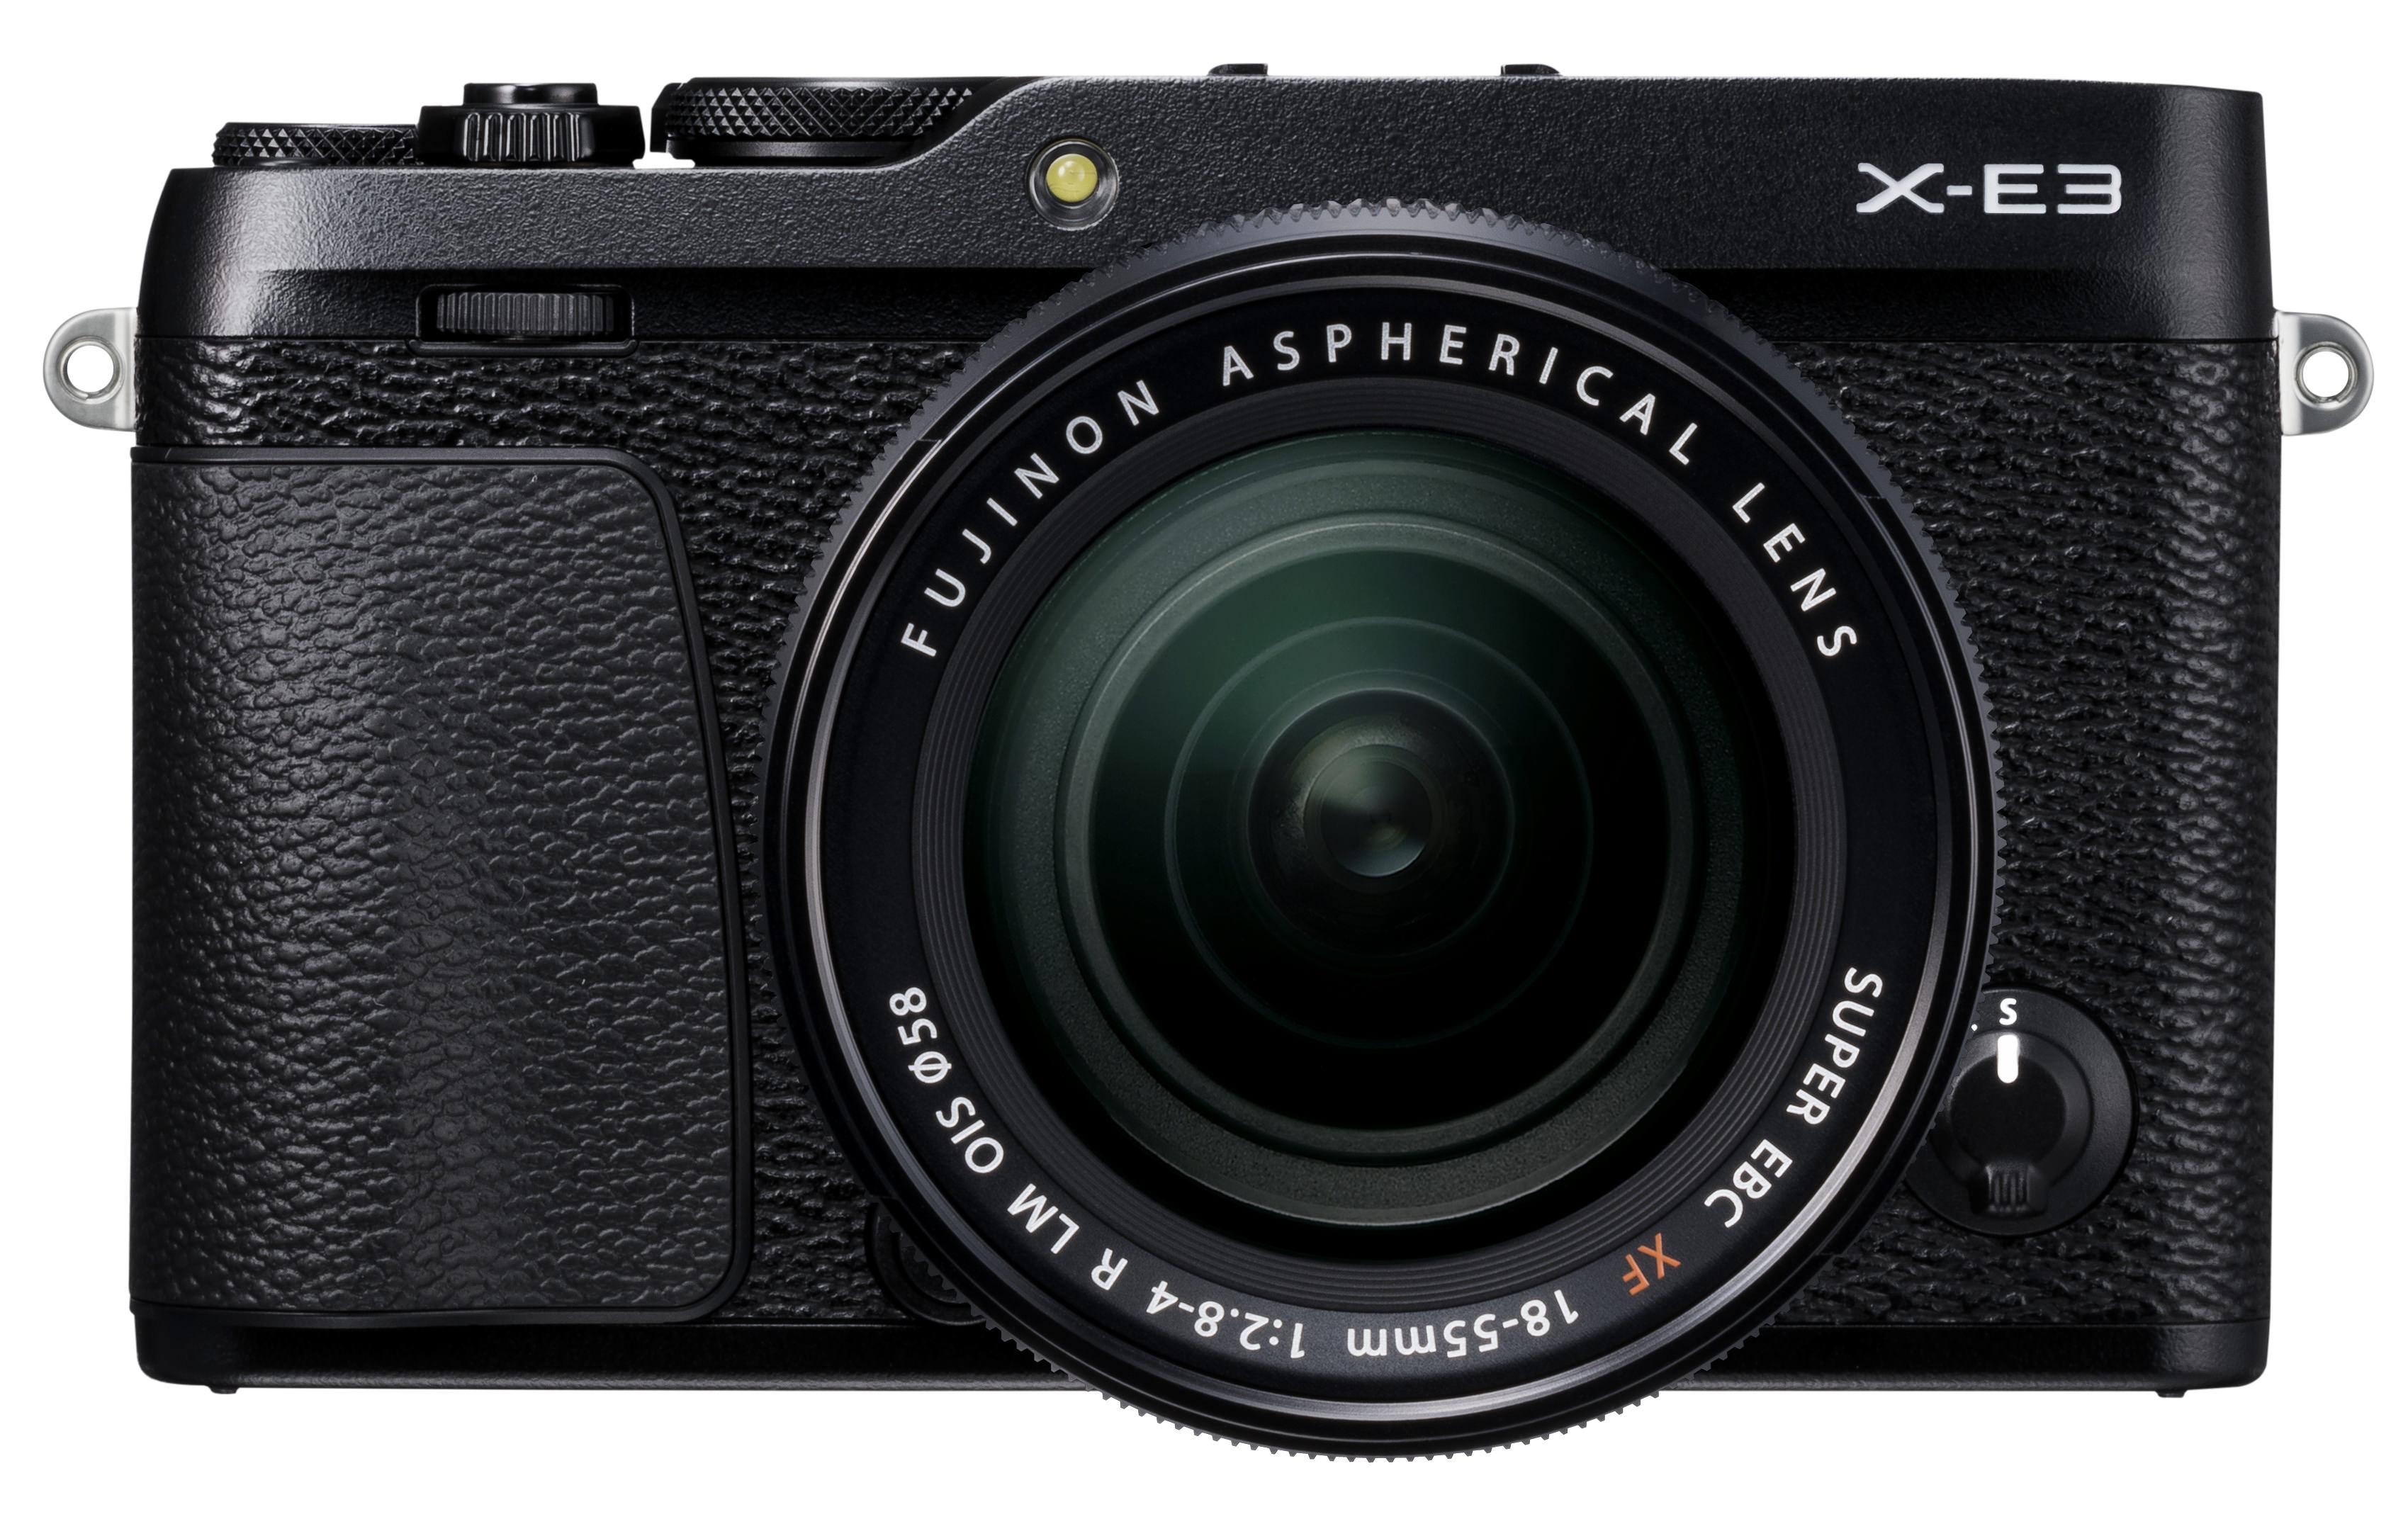 Fujifilm X-E3 Rangefinder Mirrorless Compact Camera Announced